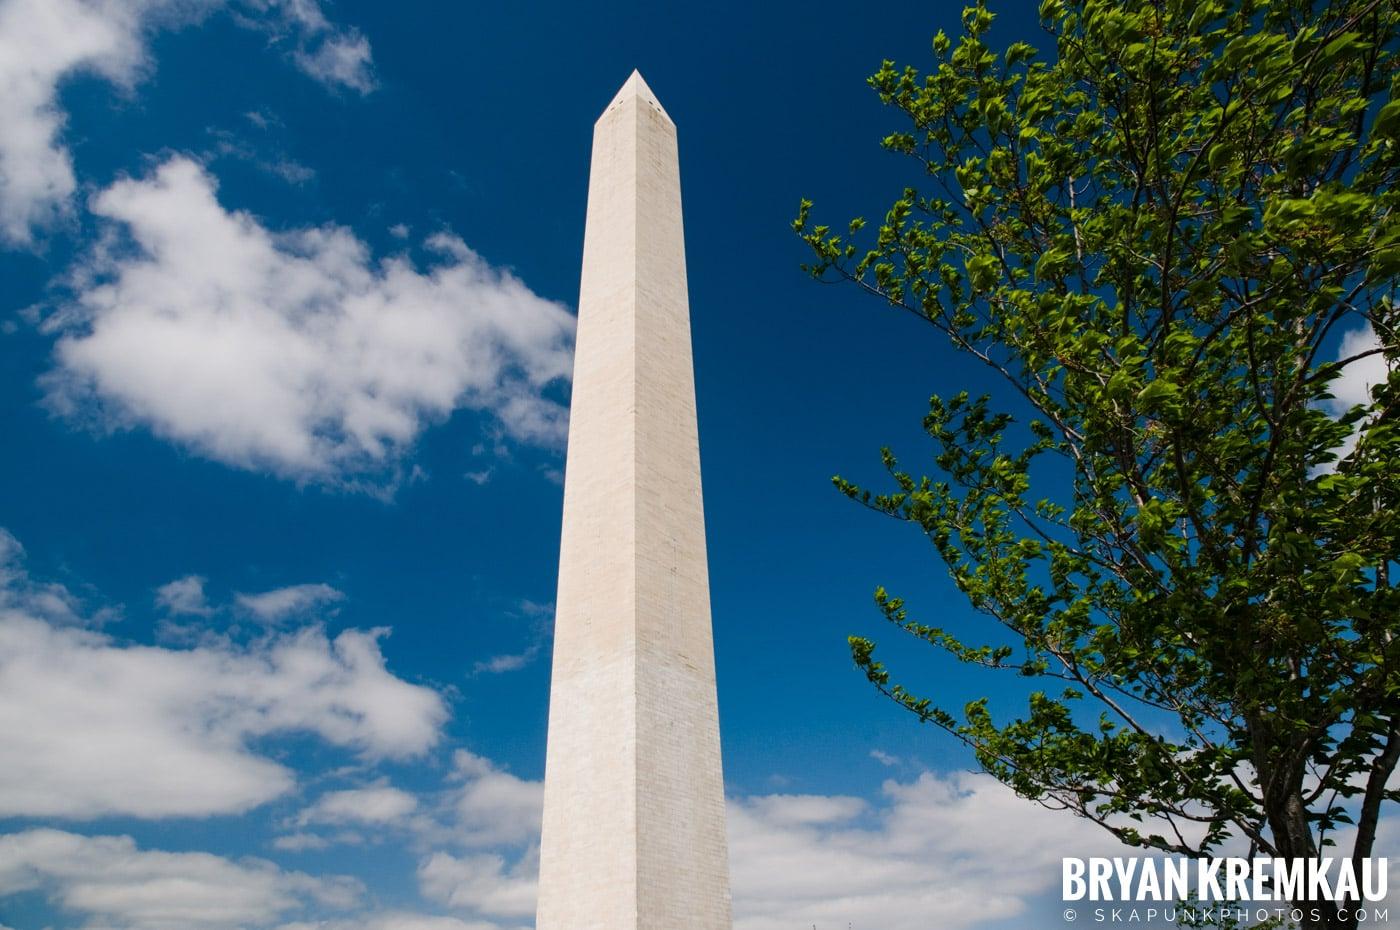 Washington, DC Trip - Day 2 - 4.9.10 (18)